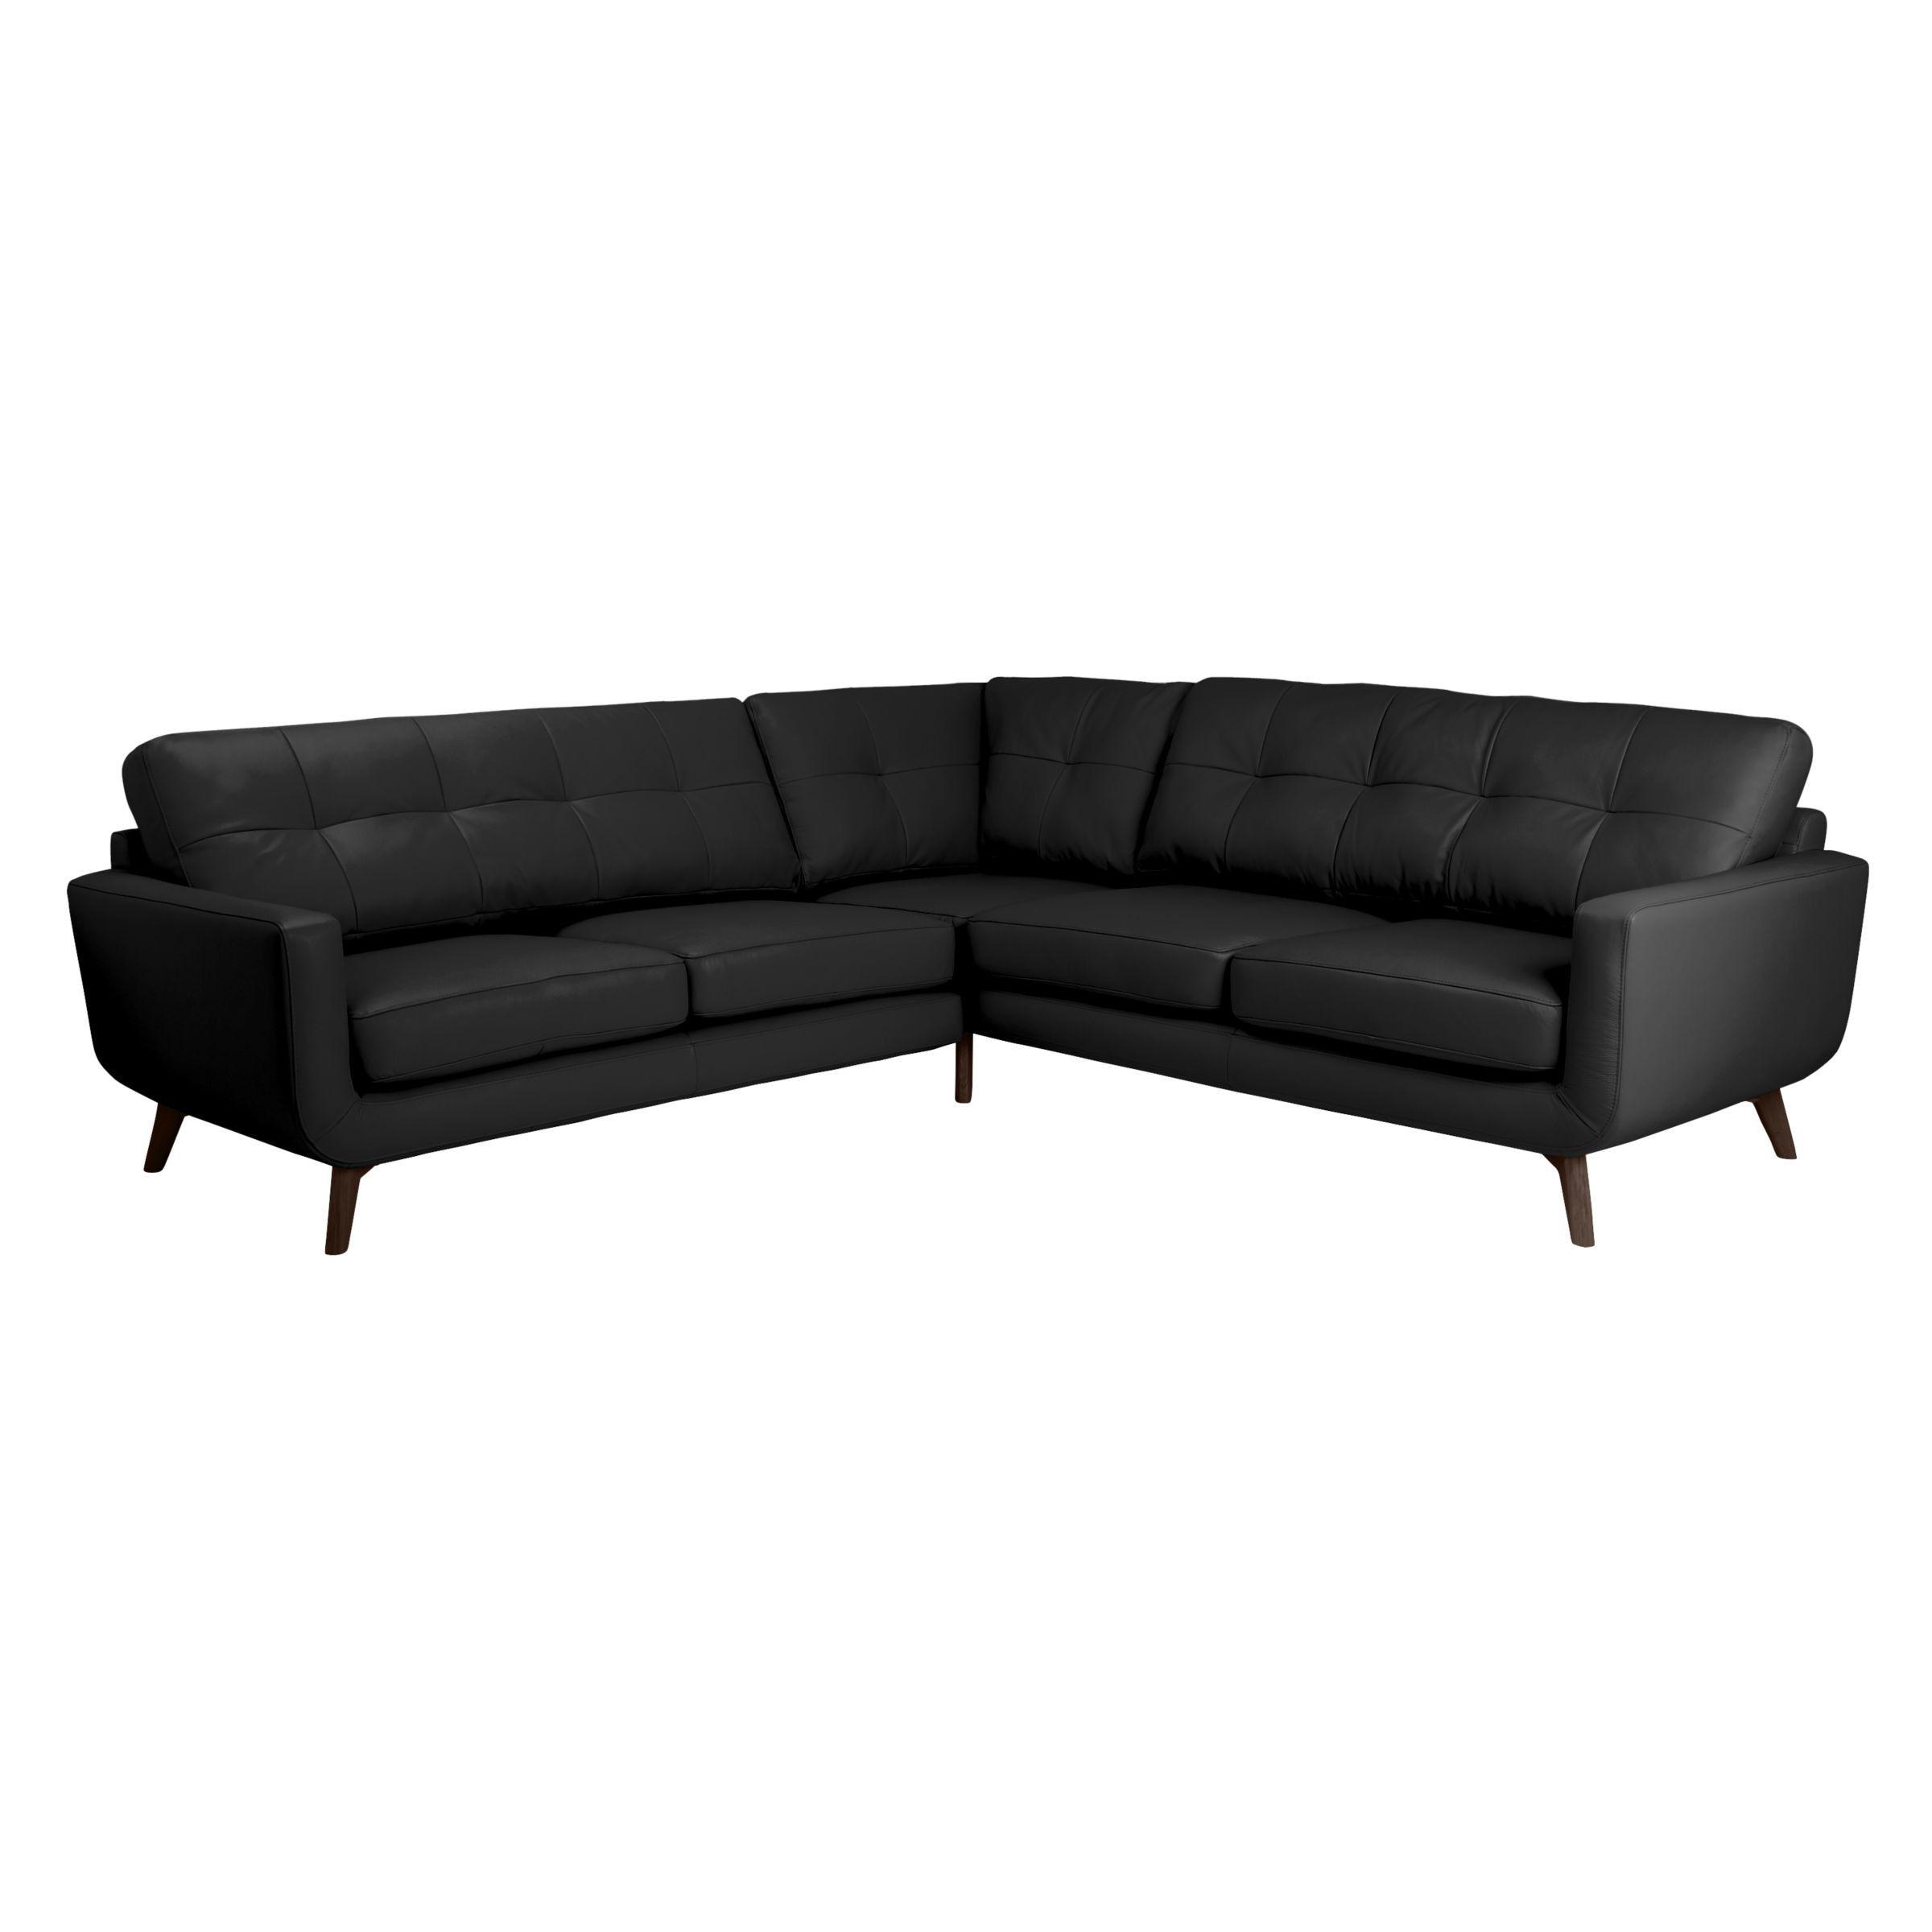 John Lewis Partners Barbican Leather Corner Sofa Dark Leg Leather Corner Sofa Corner Sofa Large Sofa